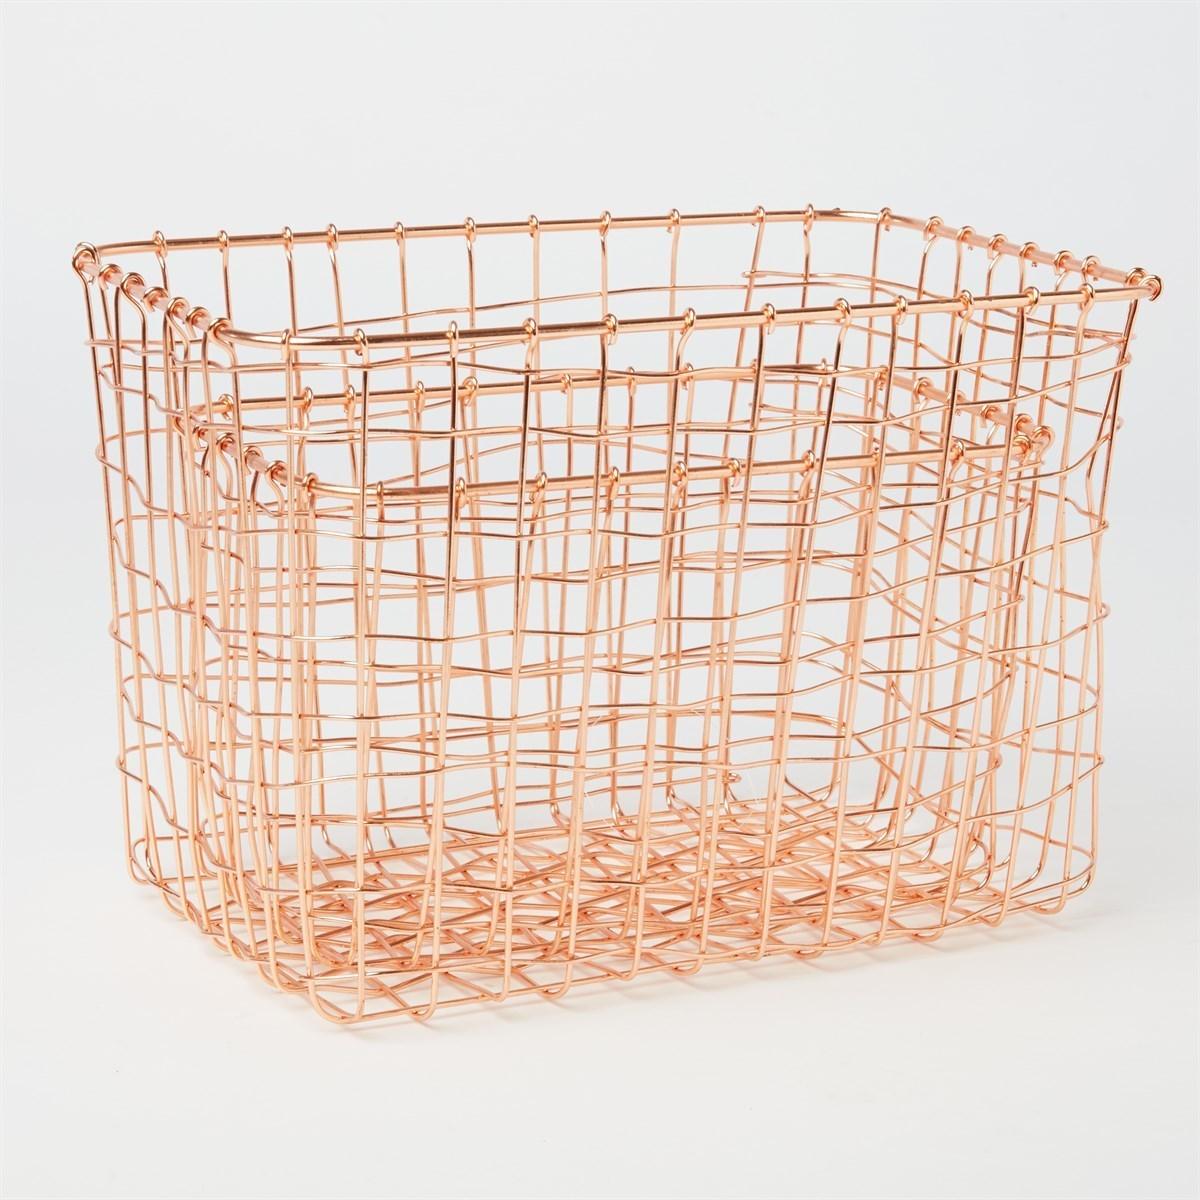 set of 2 copper wire mesh rectangular baskets alternative image 1